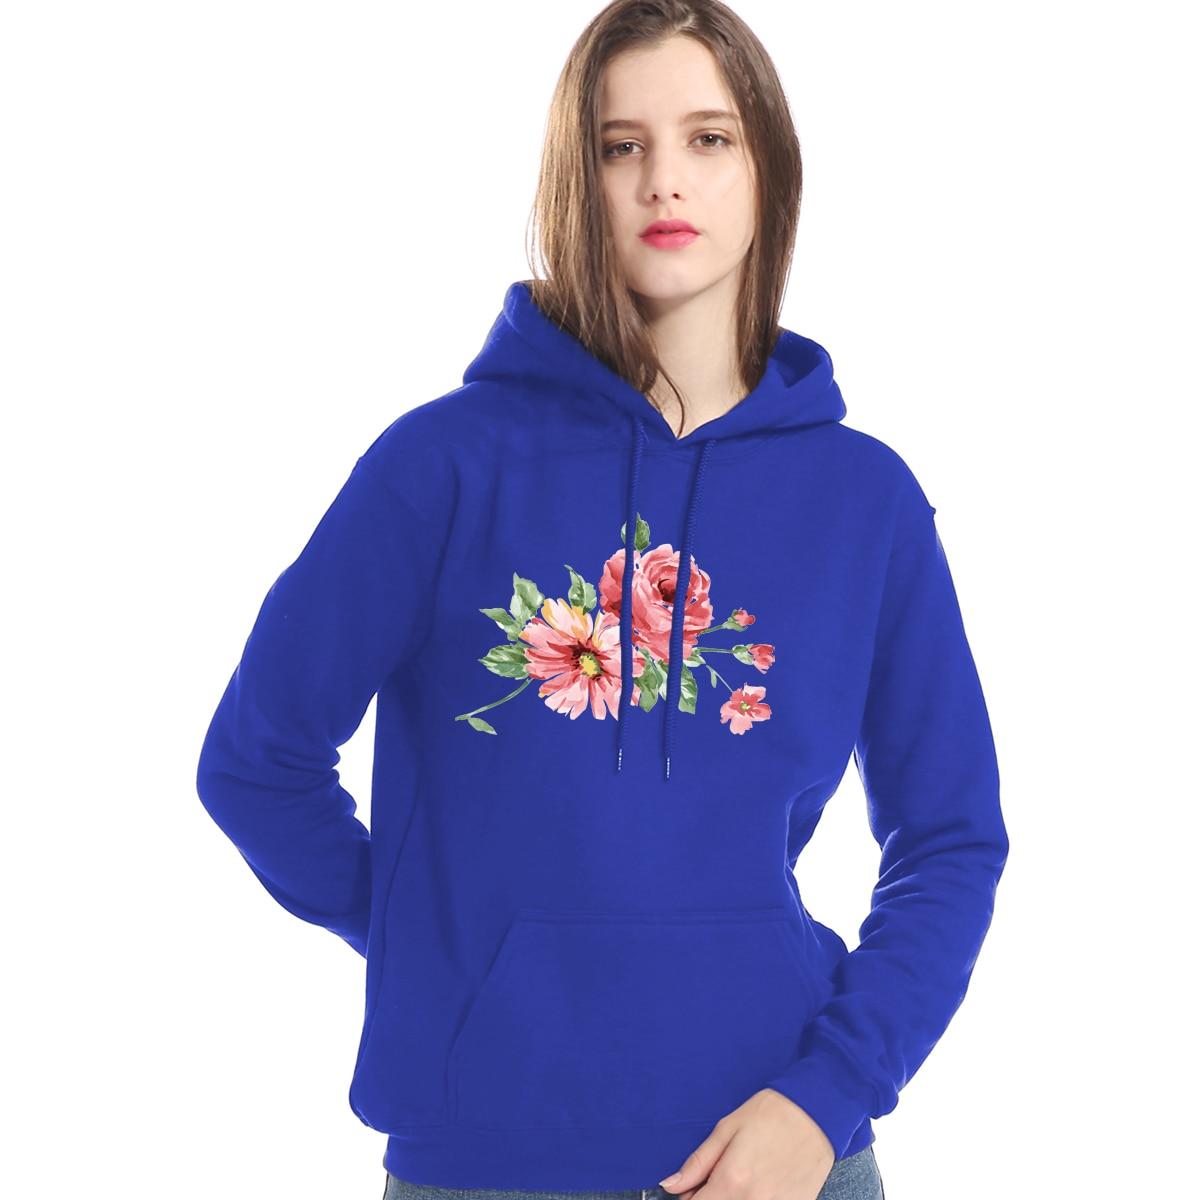 Sweatshirt For Female Hoody 2019 New Fashion Autumn Winter Brand Clothes Print Flower Kawaii Women's Hoodies Harajuku Coats Lady